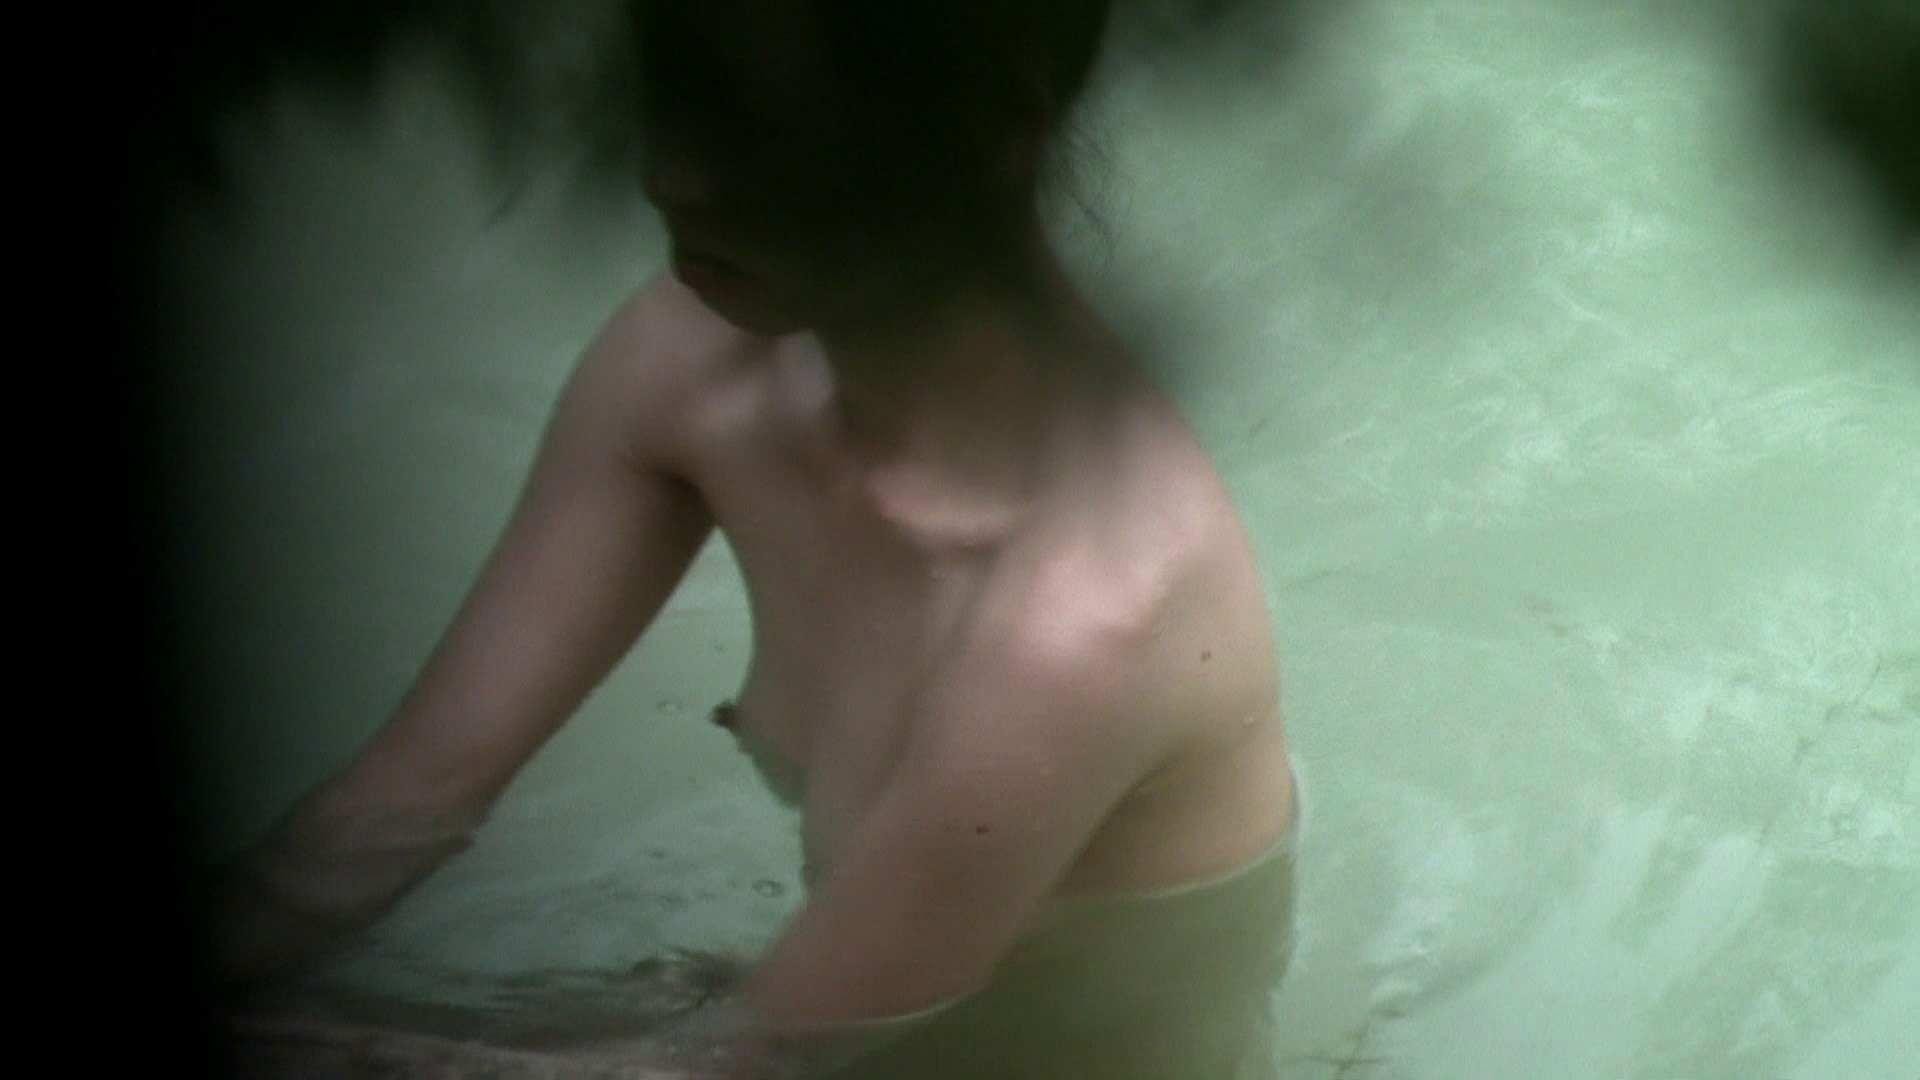 Aquaな露天風呂Vol.656 OLセックス  72画像 72